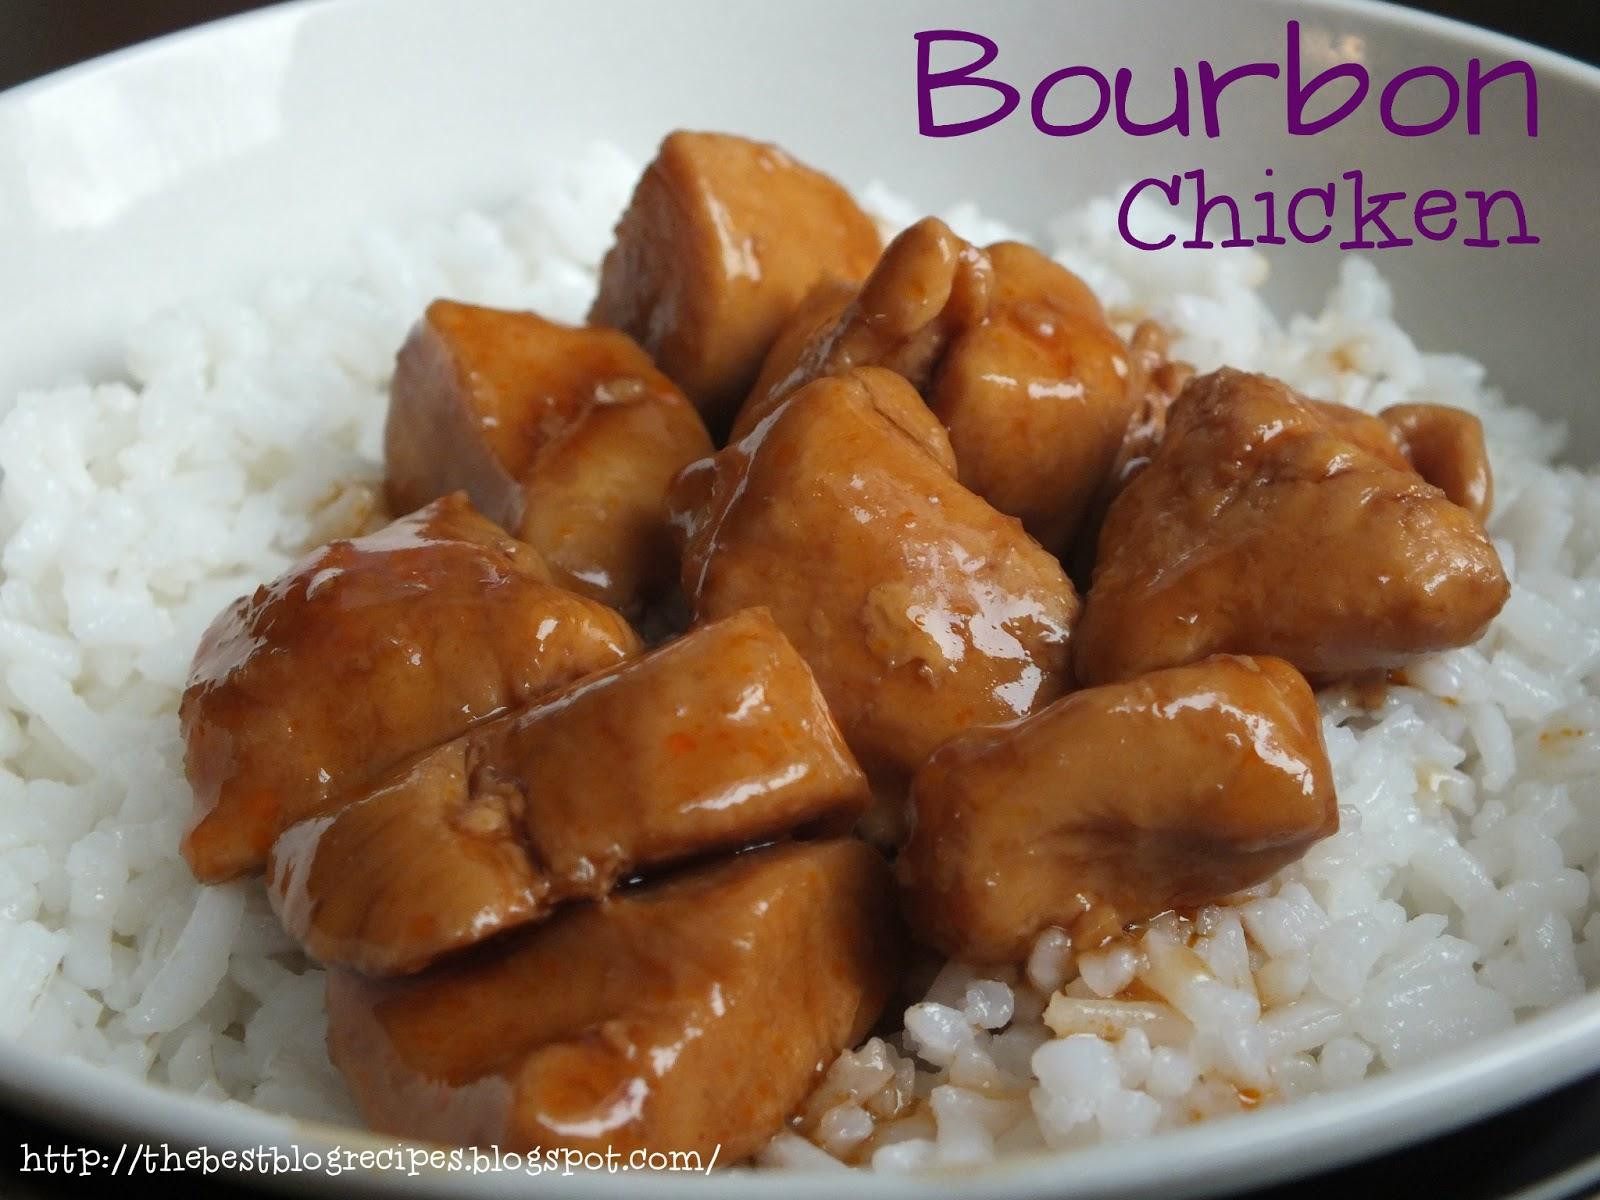 The Best Blog Recipes: Bourbon Chicken